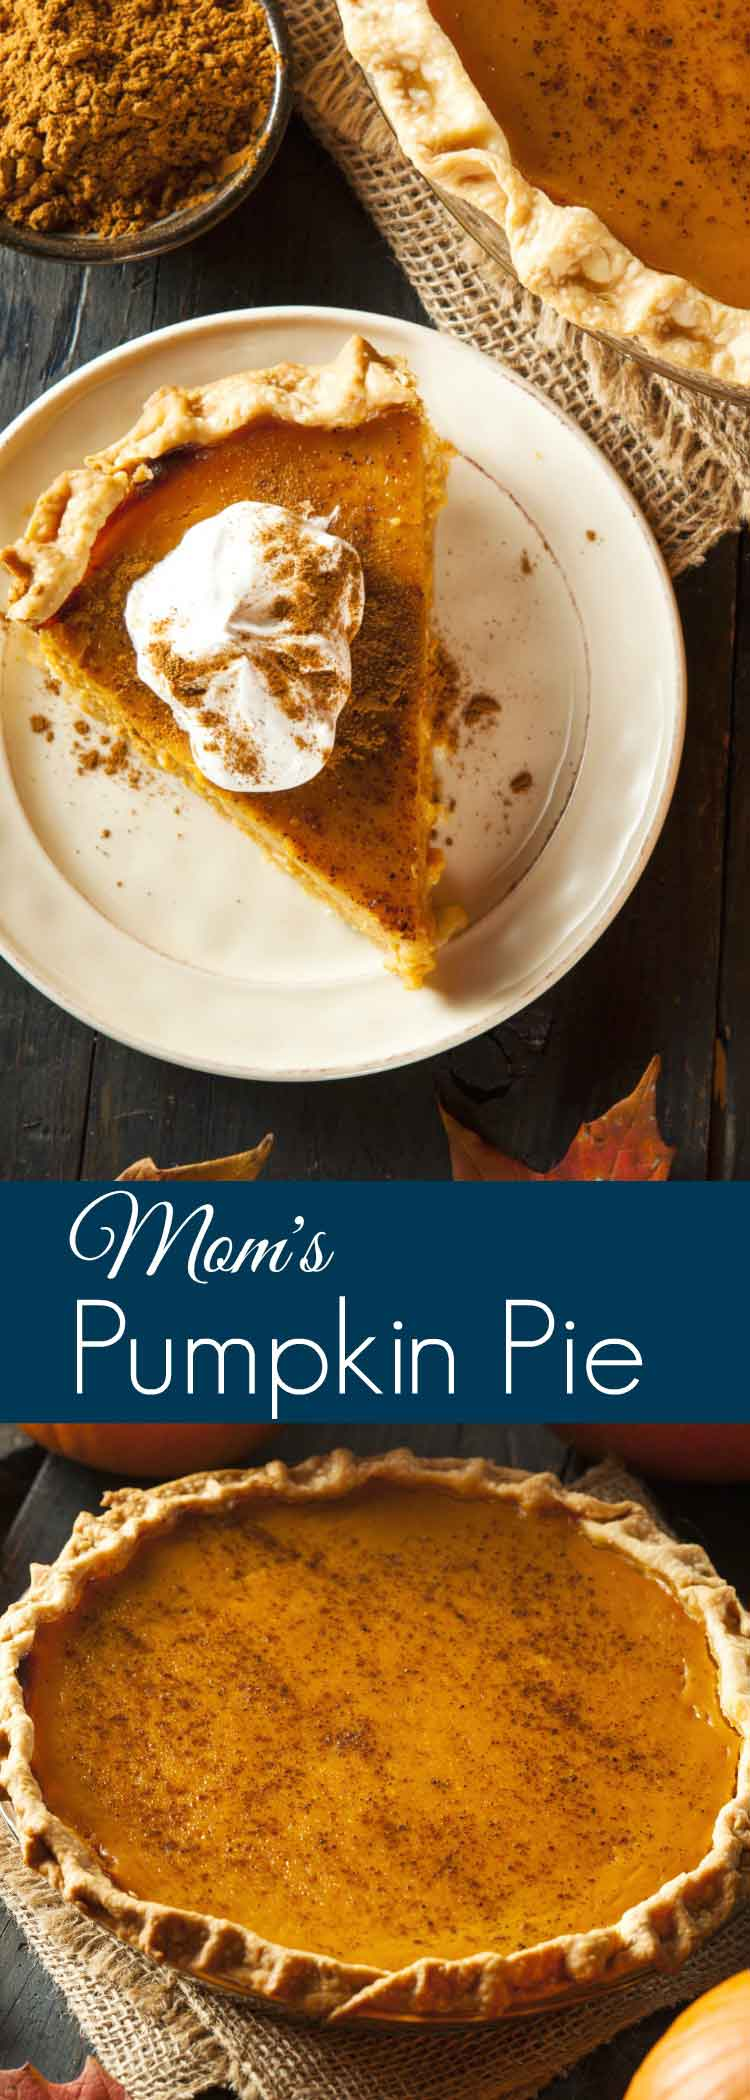 Easy Homemade Pumpkin Pie Recipe you can make from scratch for Breakfast, Lunch & Dinner! This homemade Pumpkin Pie Recipe is BIG on flavour! It's a Winner! #pumpkinpie #holidaydesserts #pie #flakypiecrust #homemadepumpkinpie #thanksgivingdinner